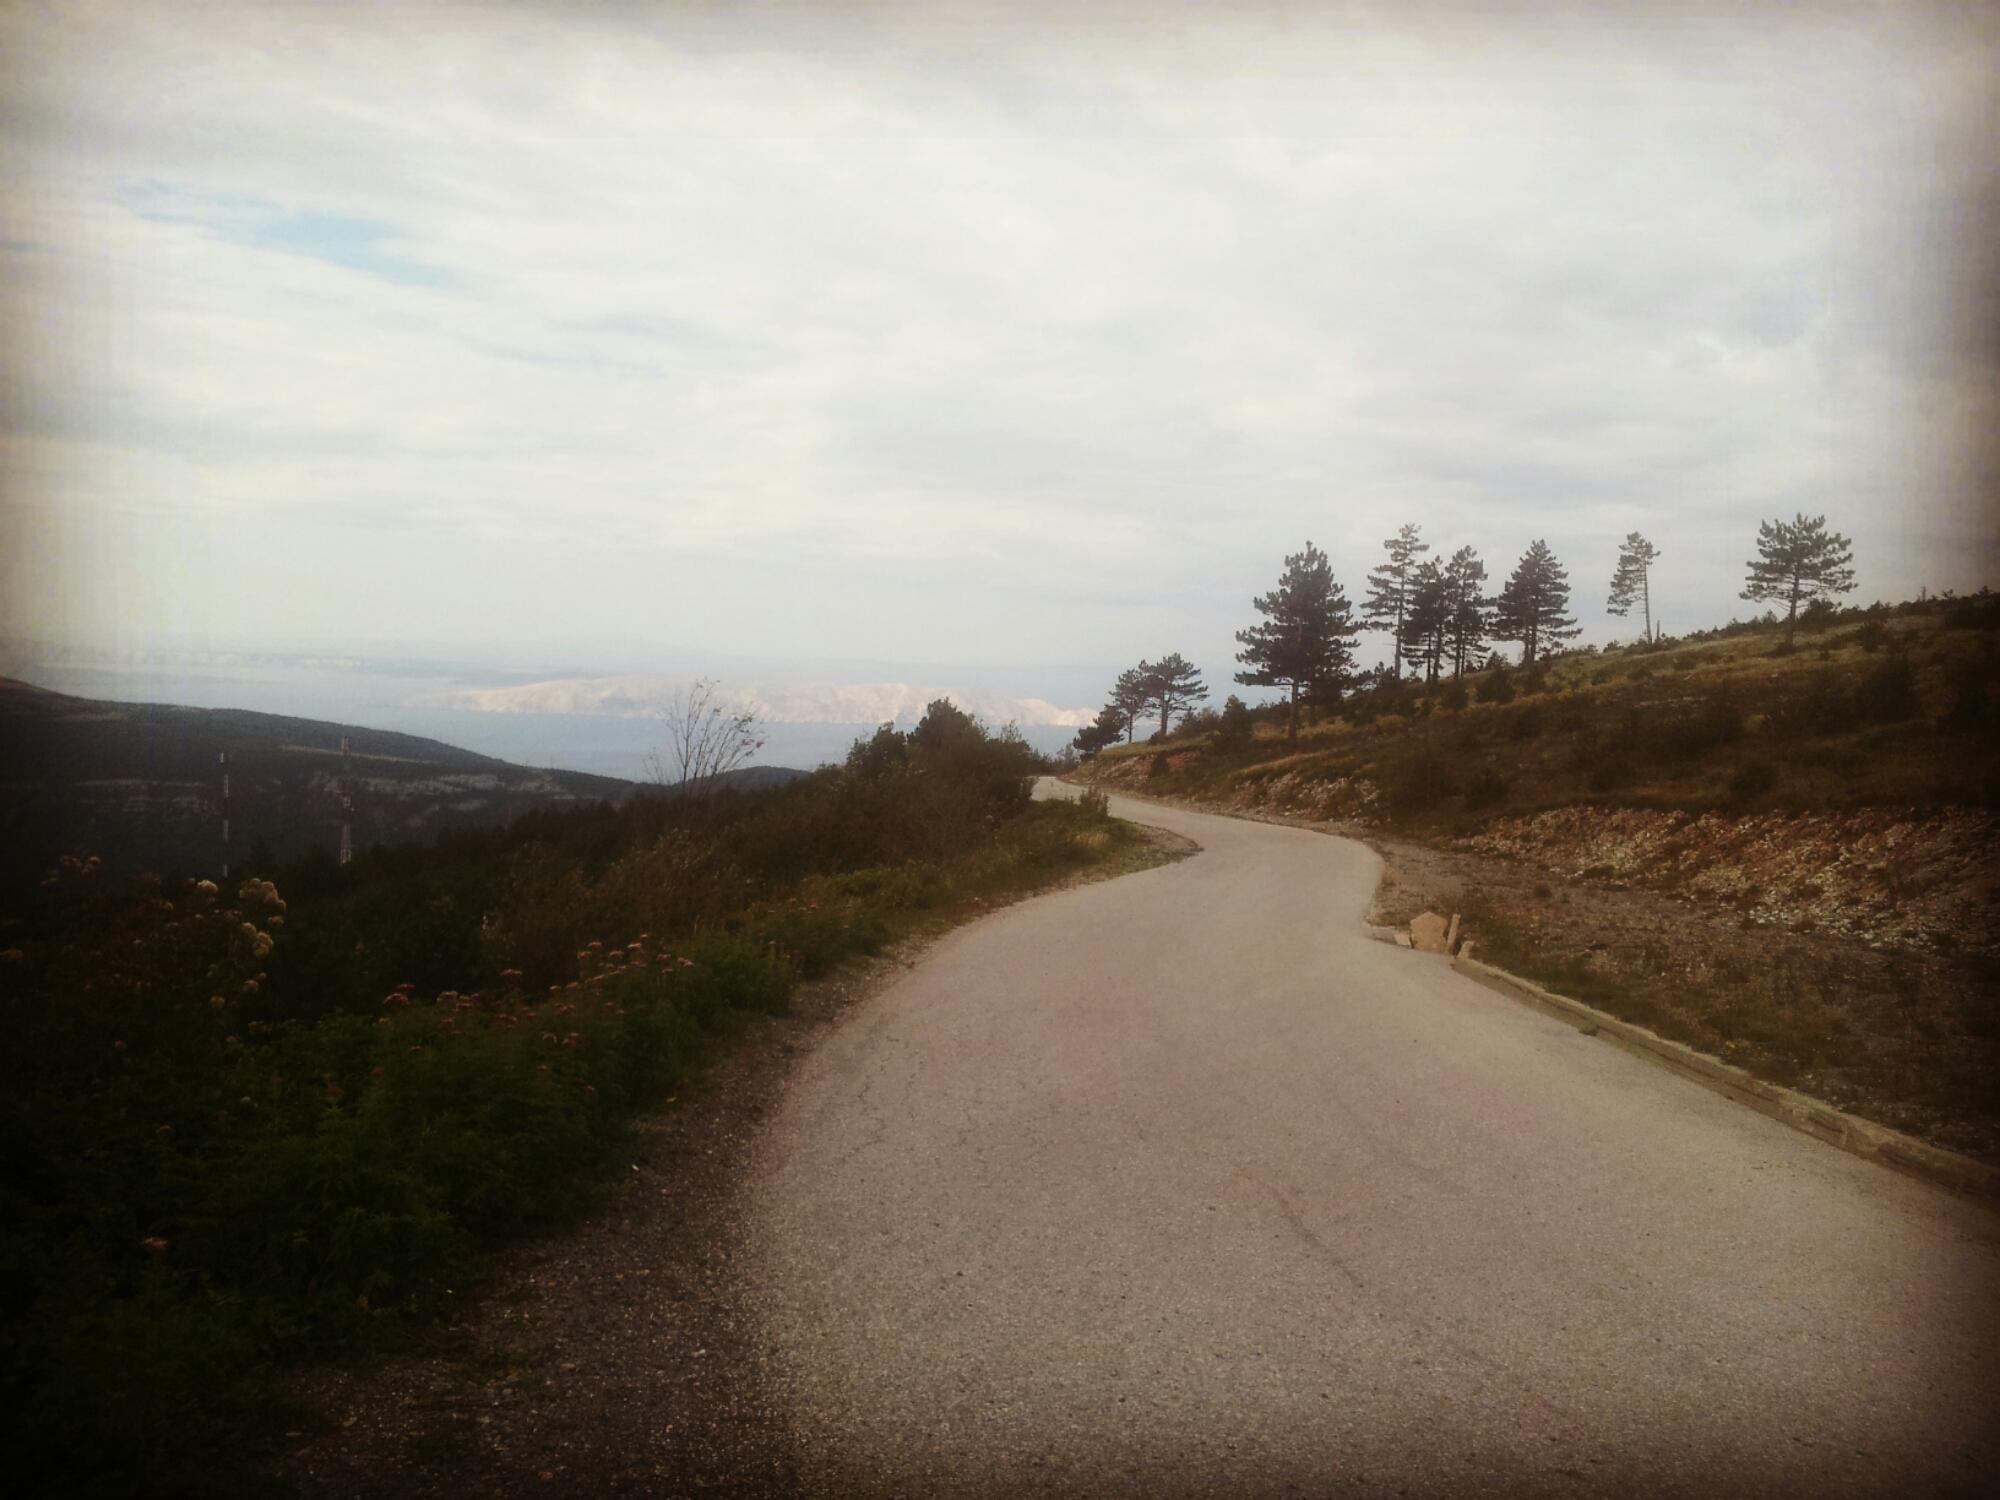 road-to-krivi-put-northern-velebit-hiking-via-dinarica-croatia